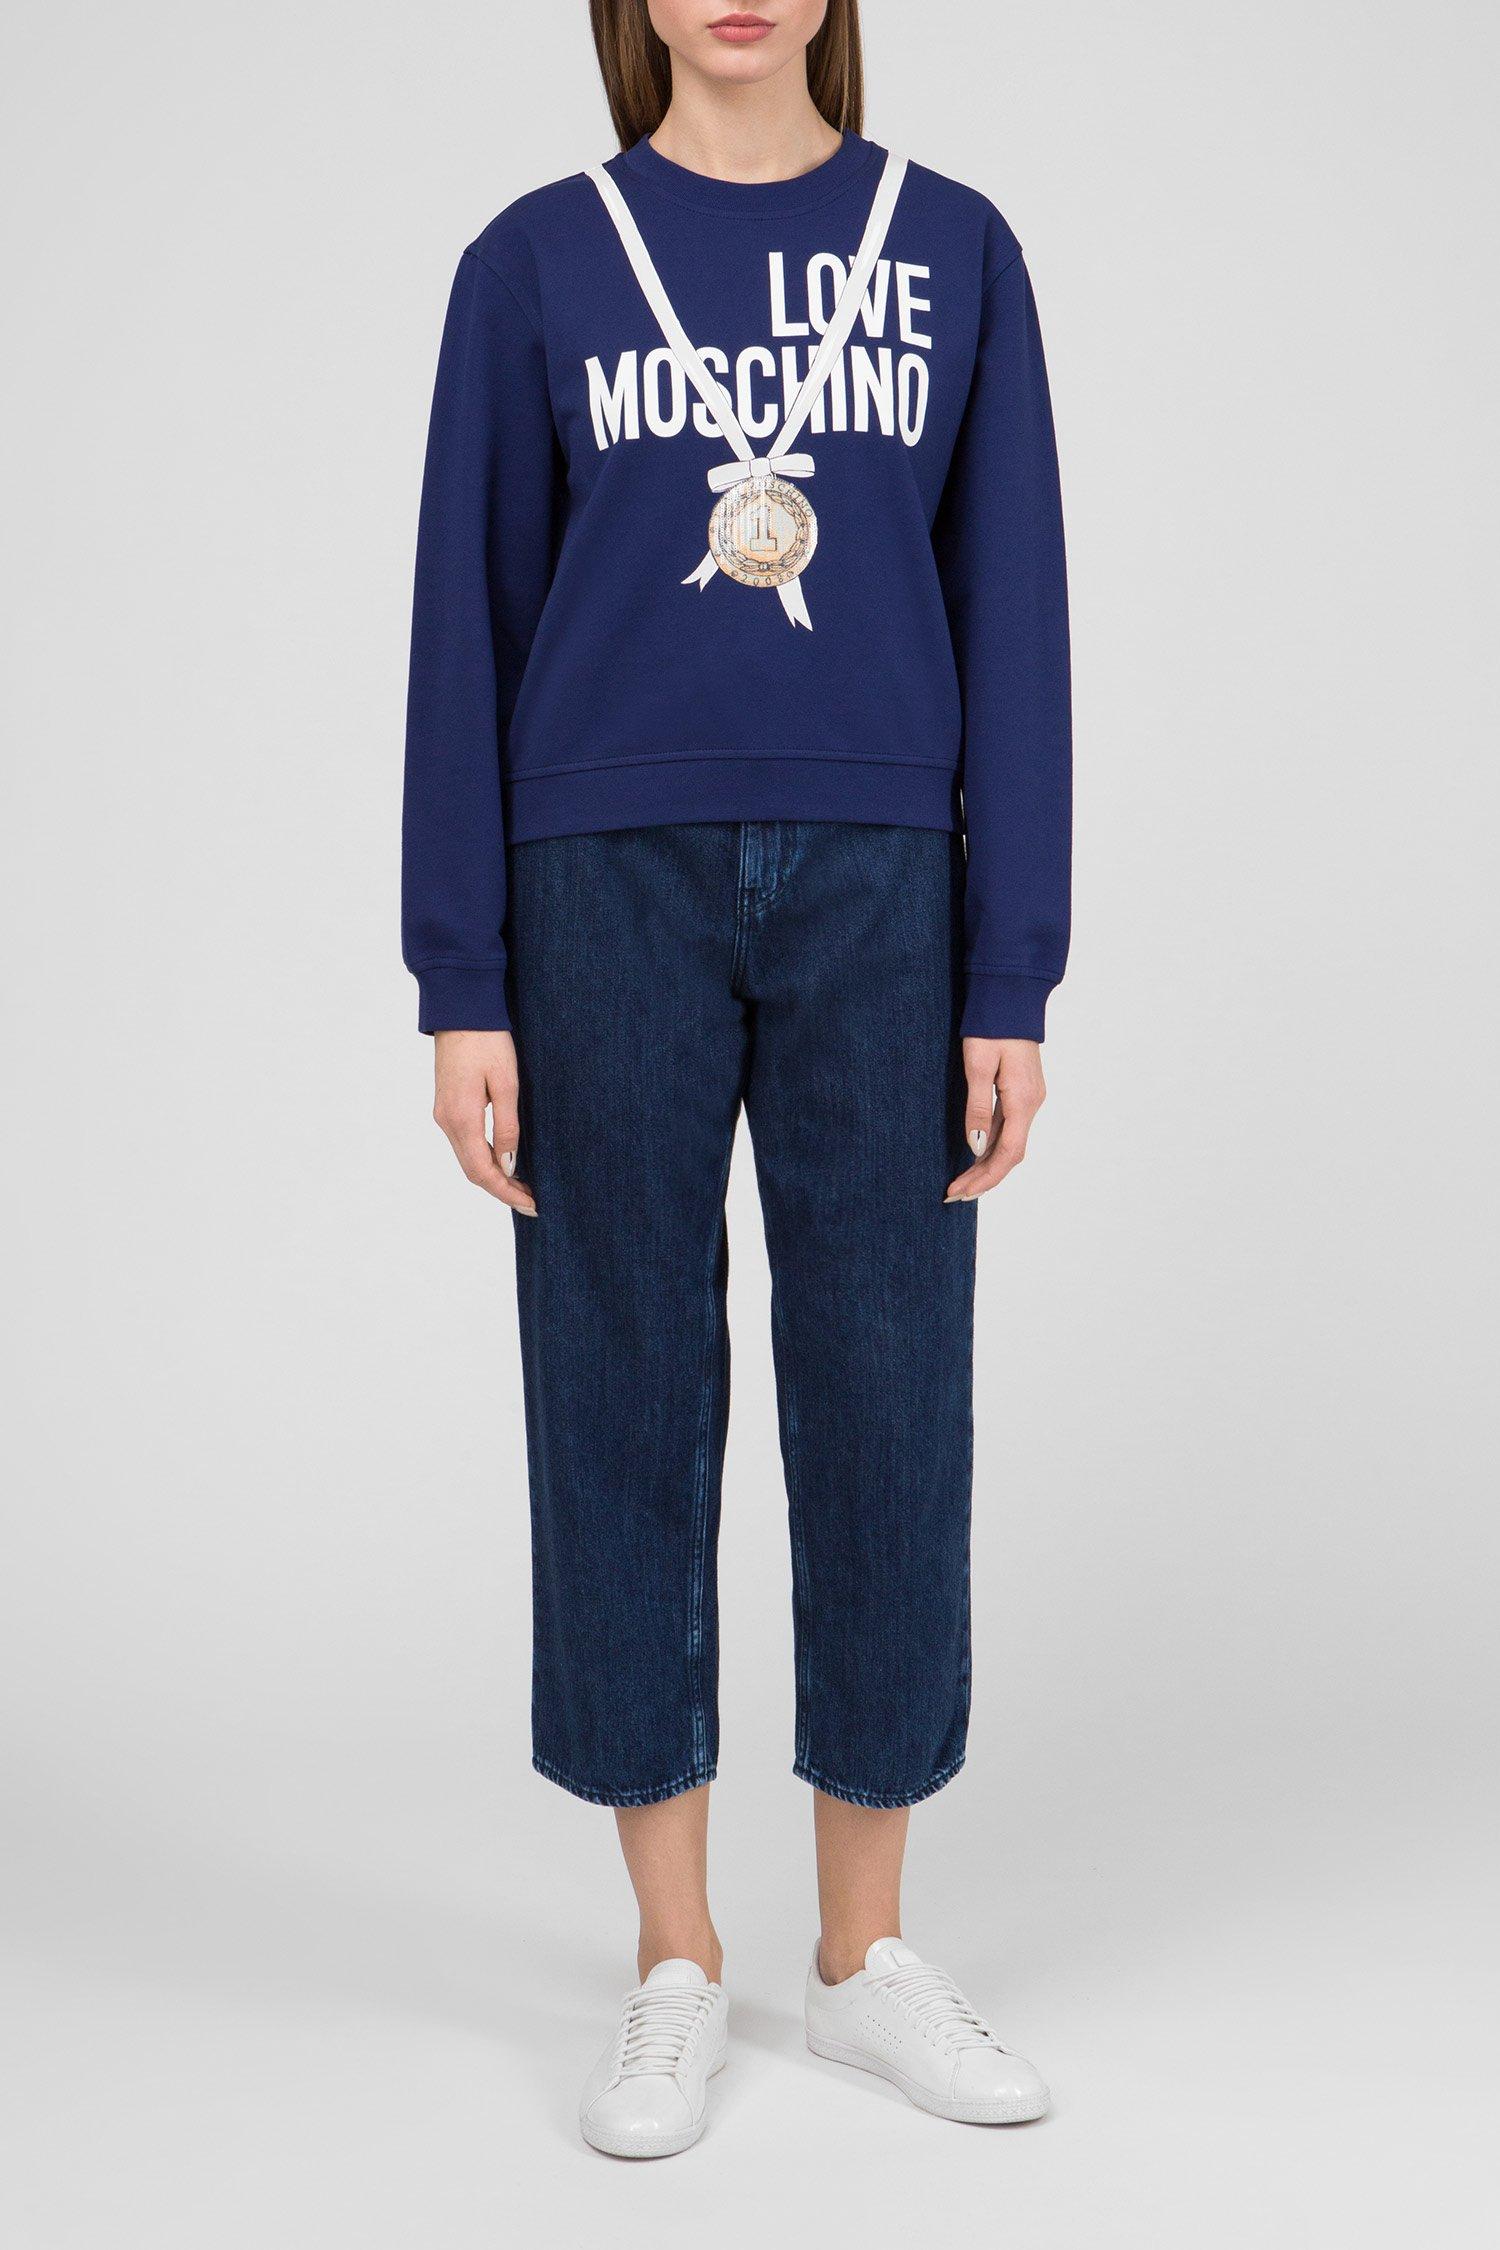 Женский синий свитшот с принтом Love Moschino